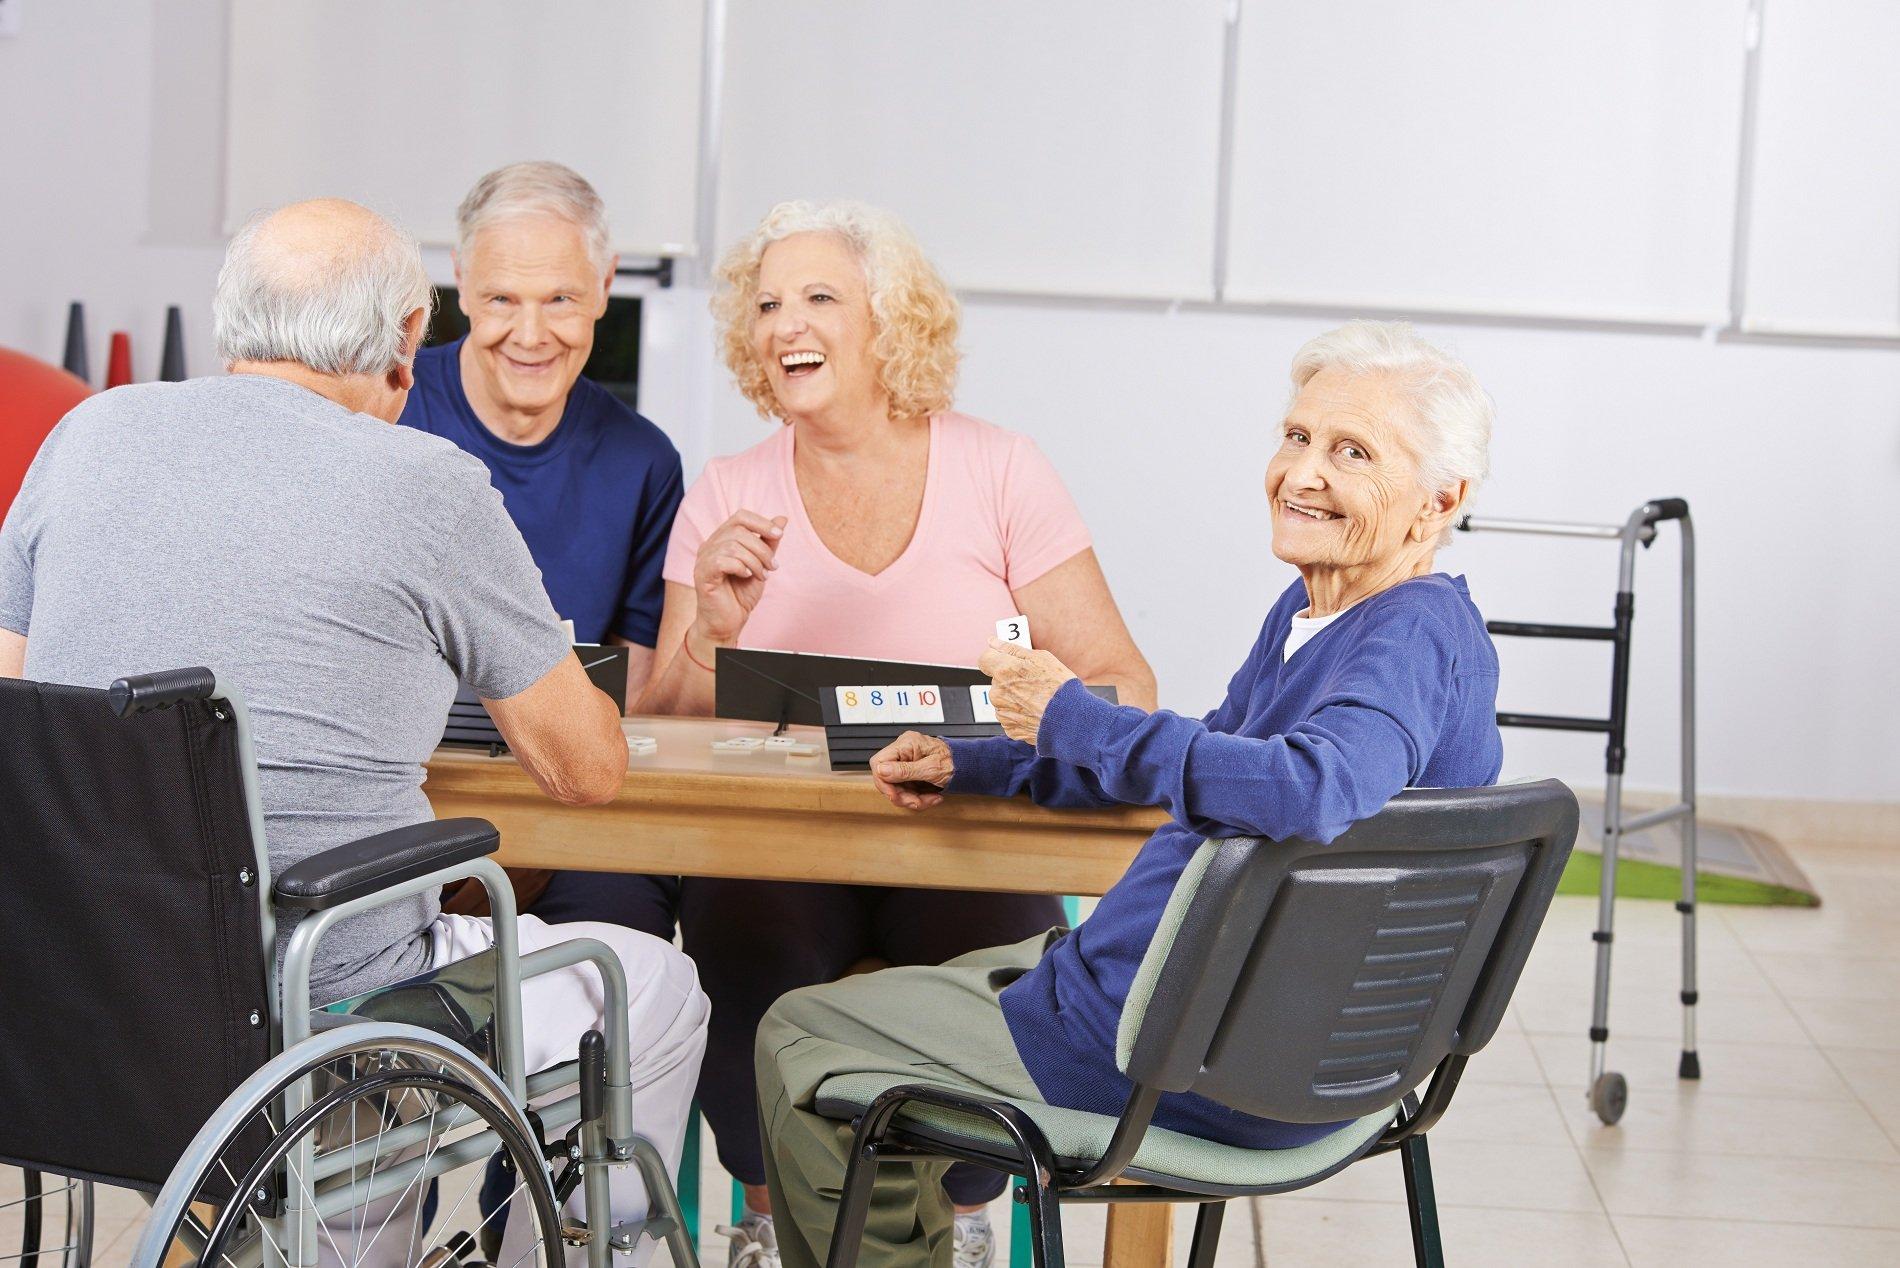 anziani giocano